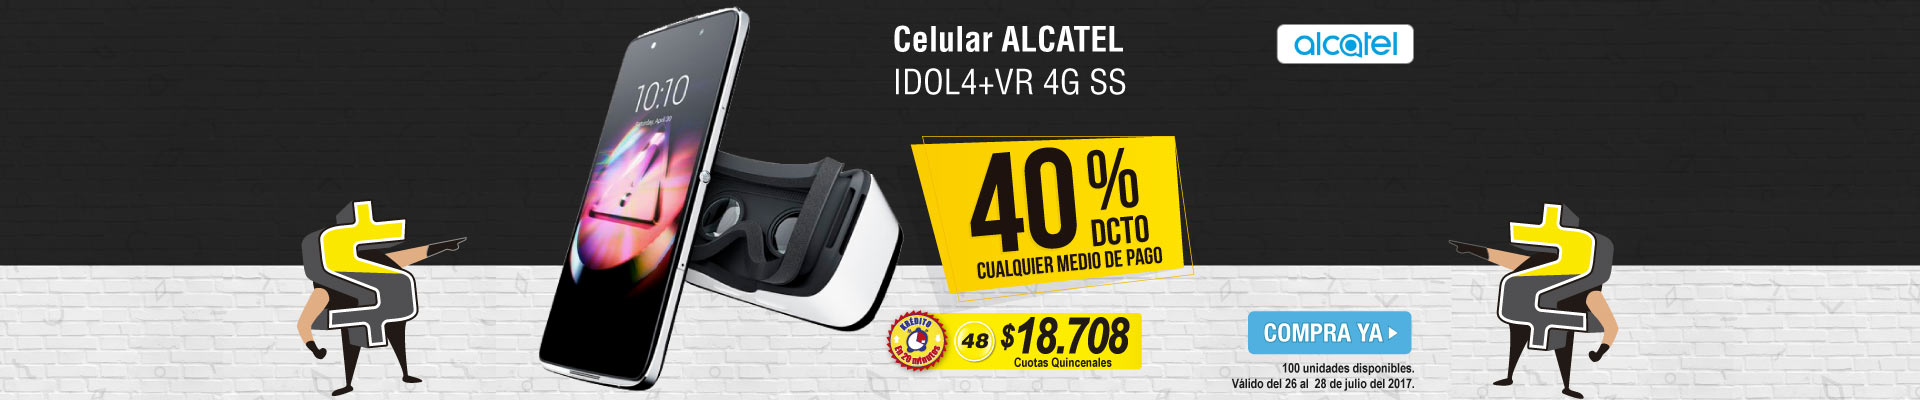 Celular ALCATEL IDOL4+VR 4G SS Negro - banner principal